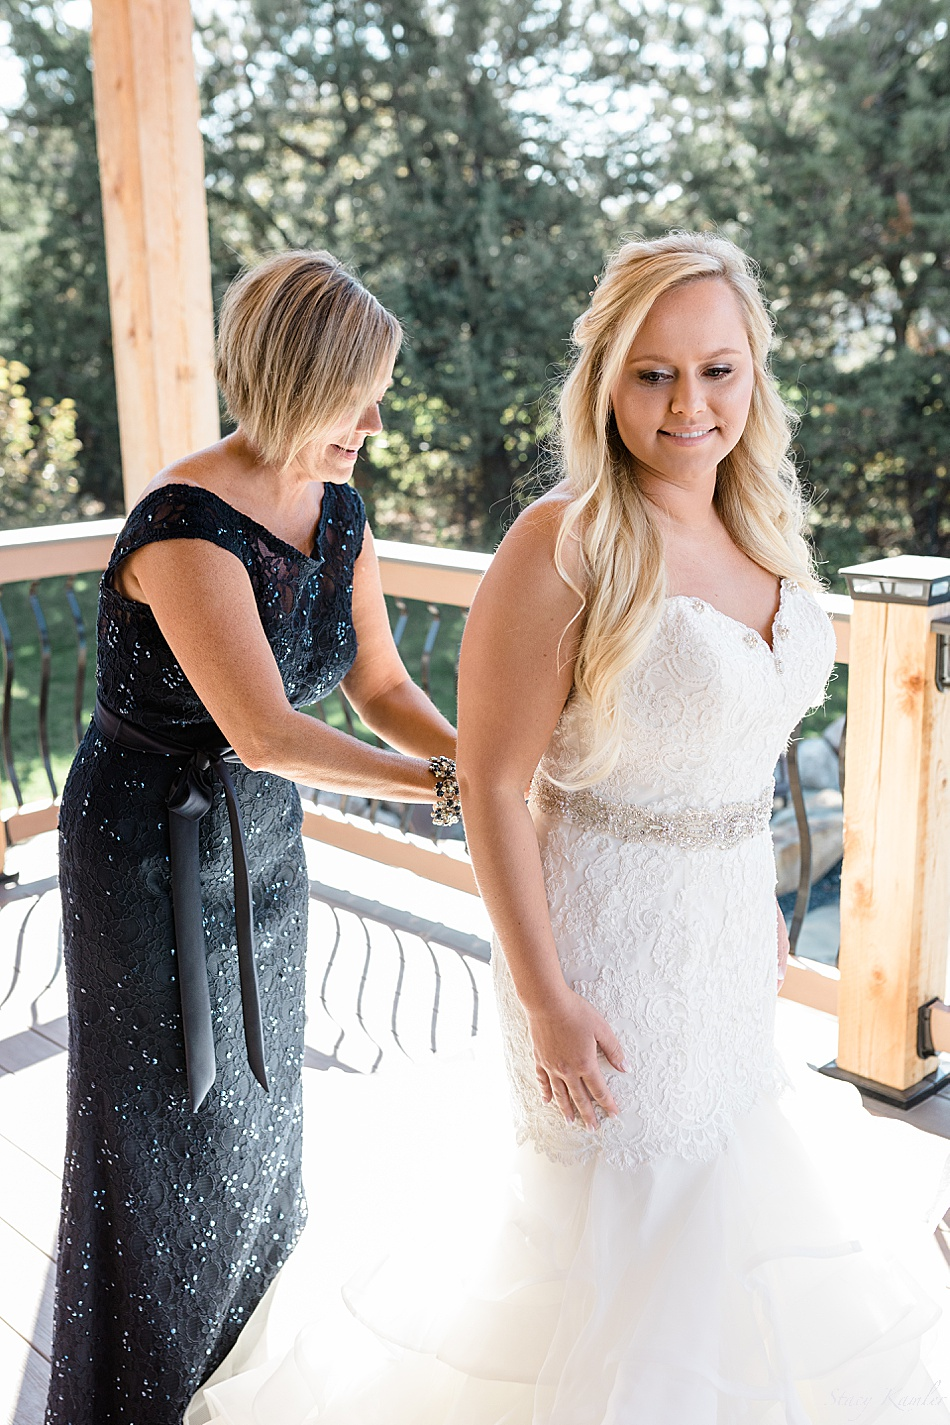 Bride putting on Mori Lee wedding dress